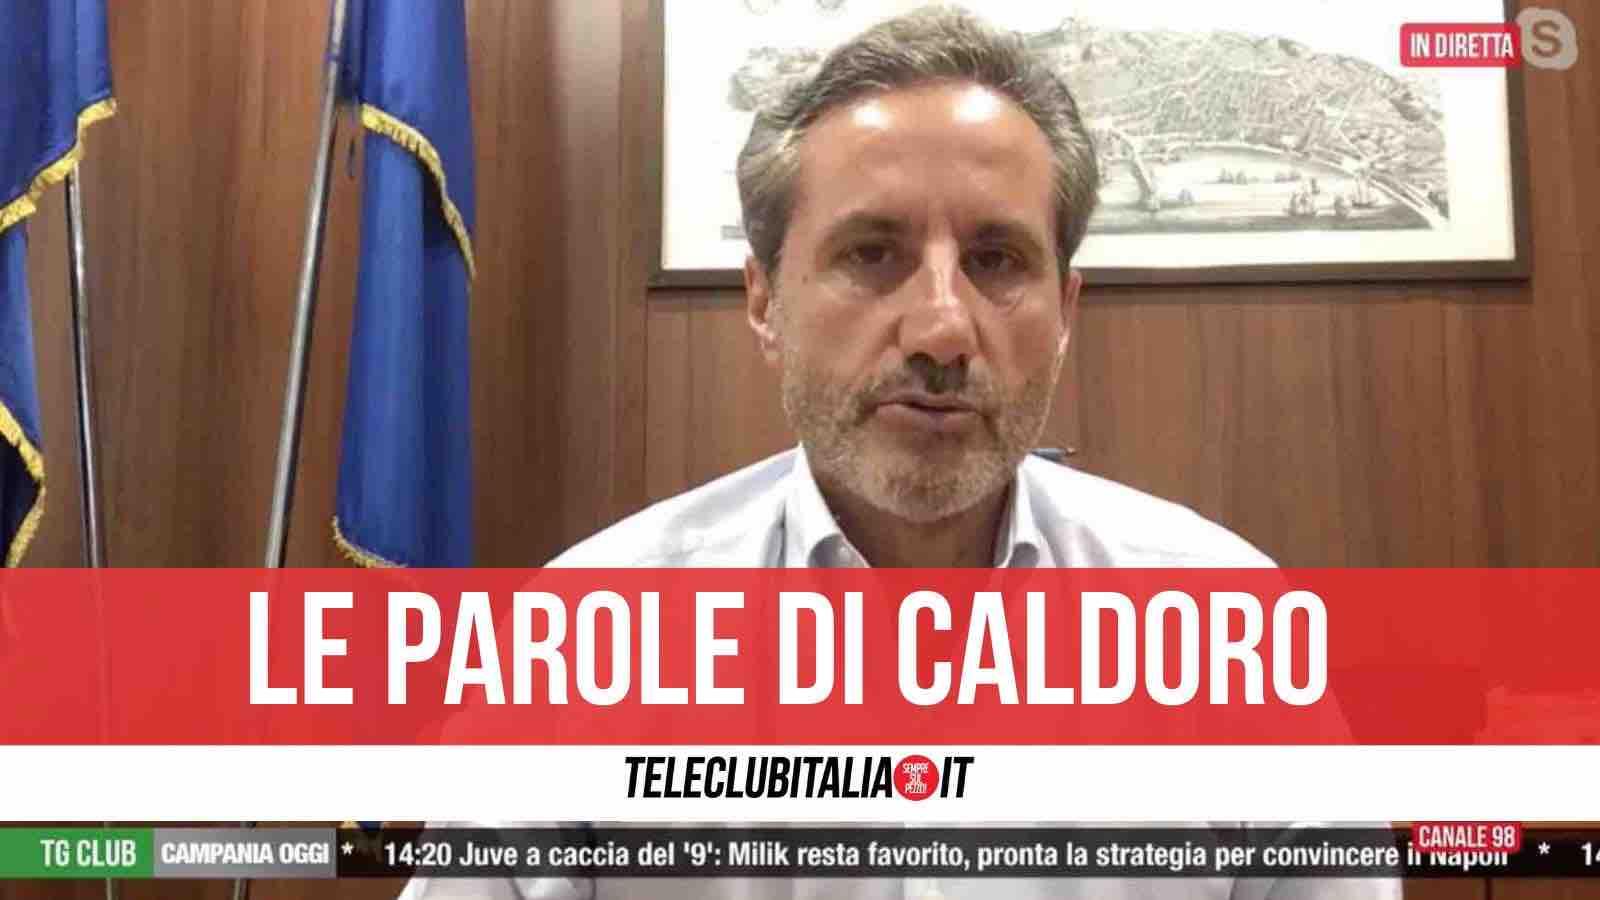 caldoro teleclubitalia